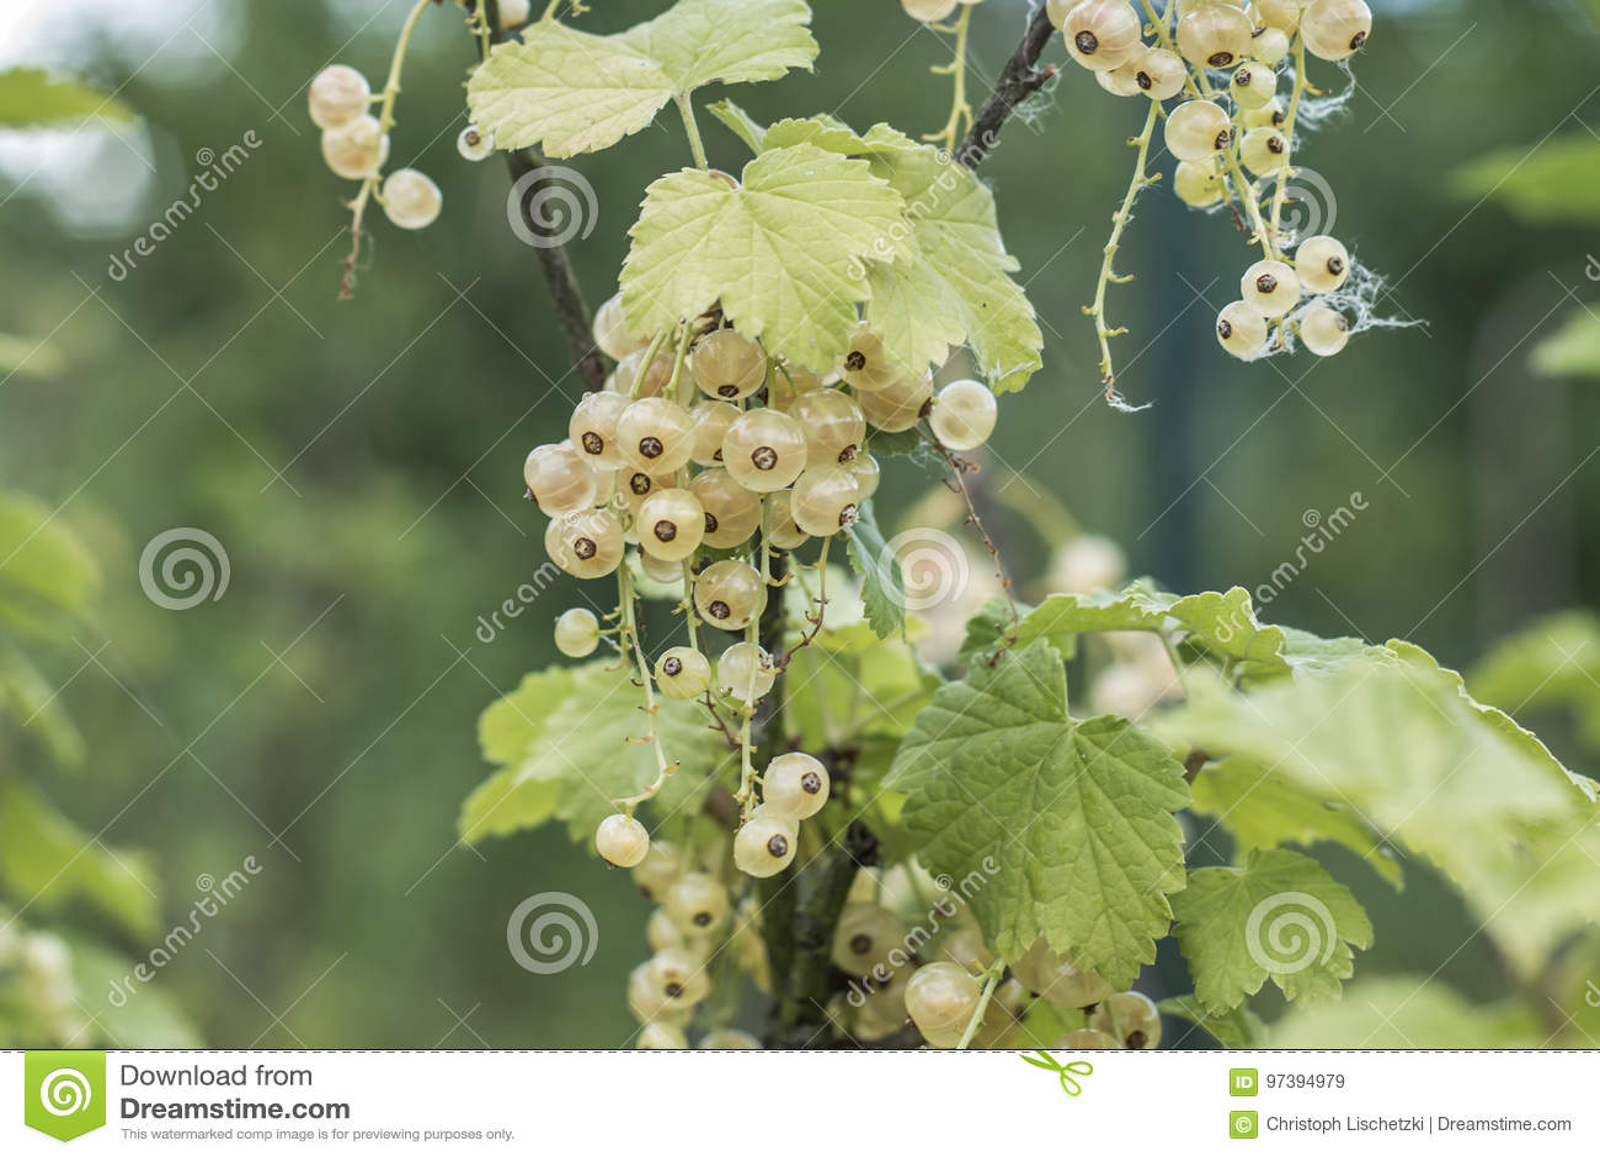 plant ripe white currant berries fruit bio organic backyard